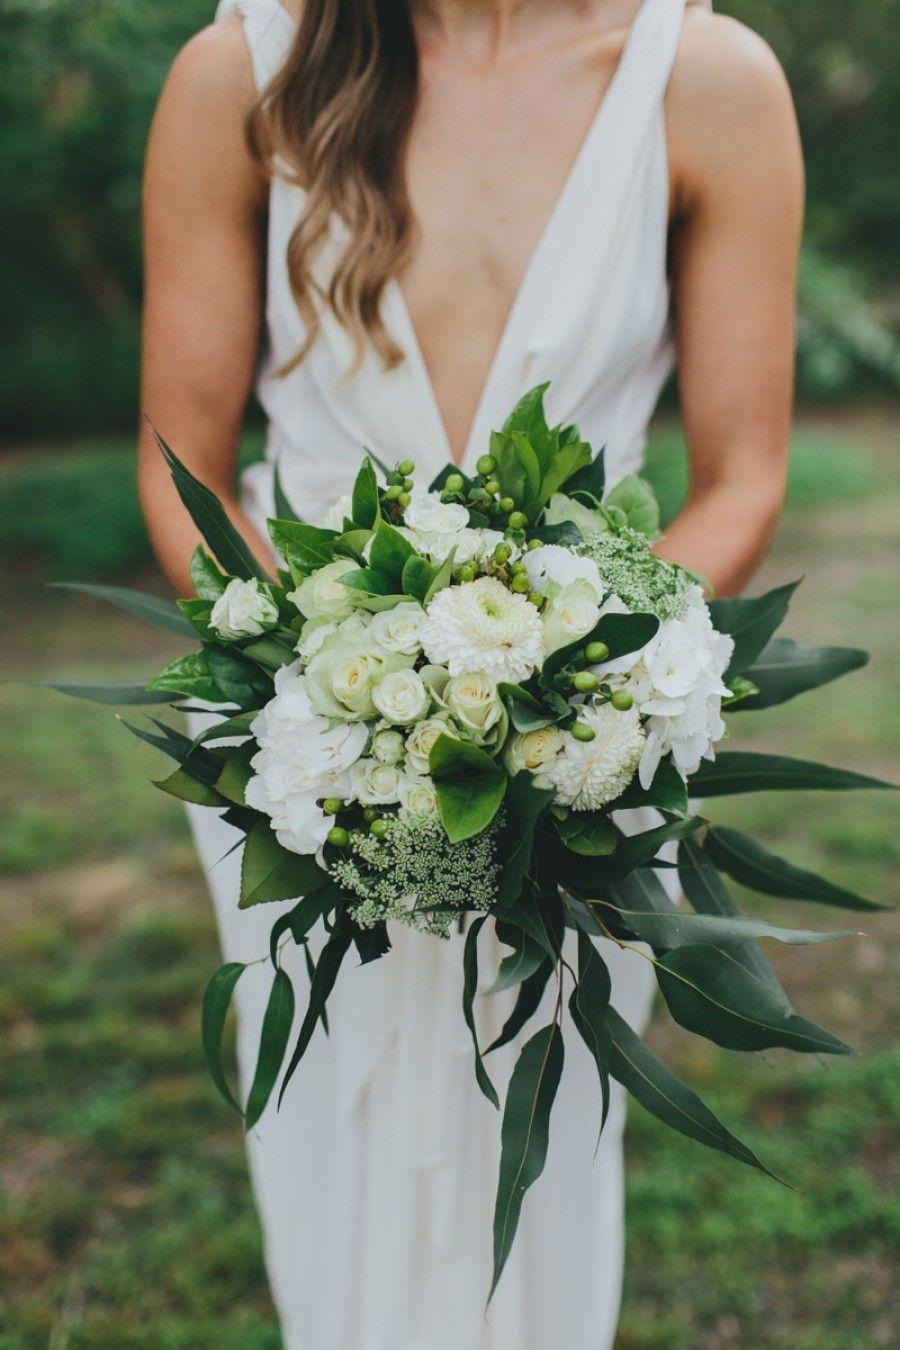 courtney  u0026 nathan u0026 39 s alowyn gardens wedding